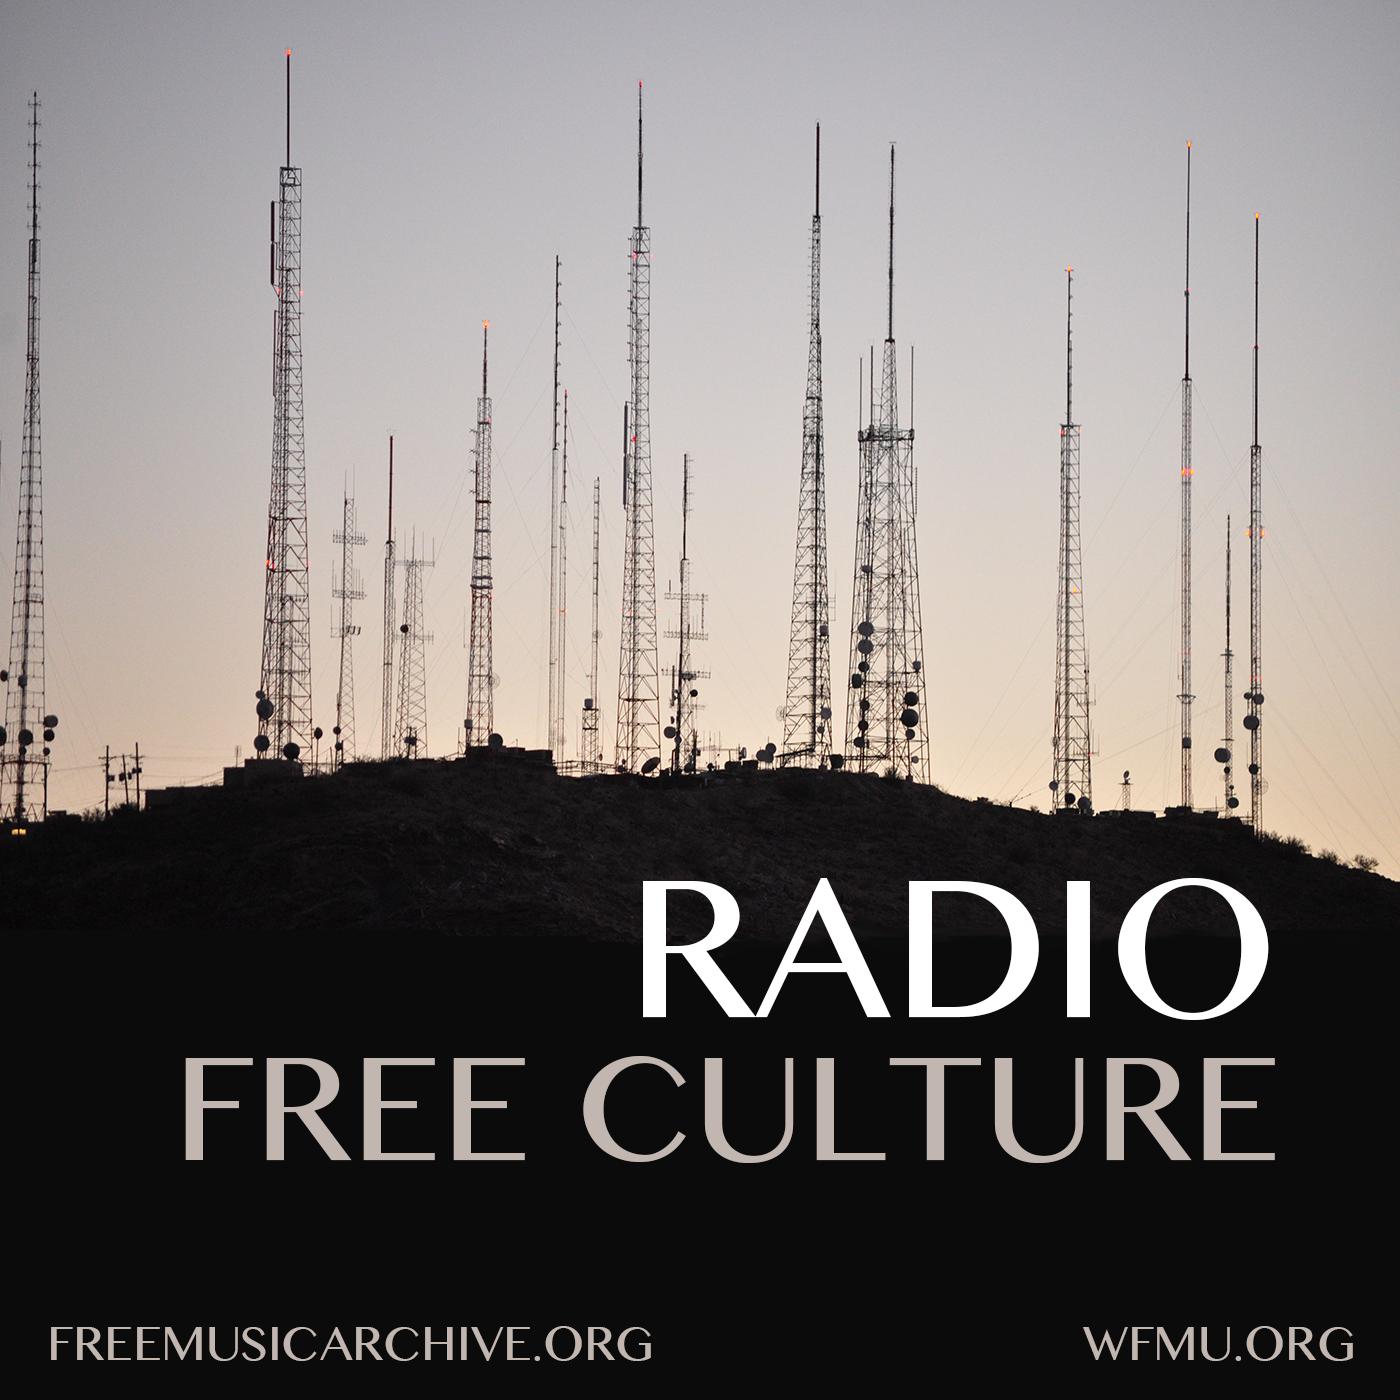 Radio Free Culture | WFMU